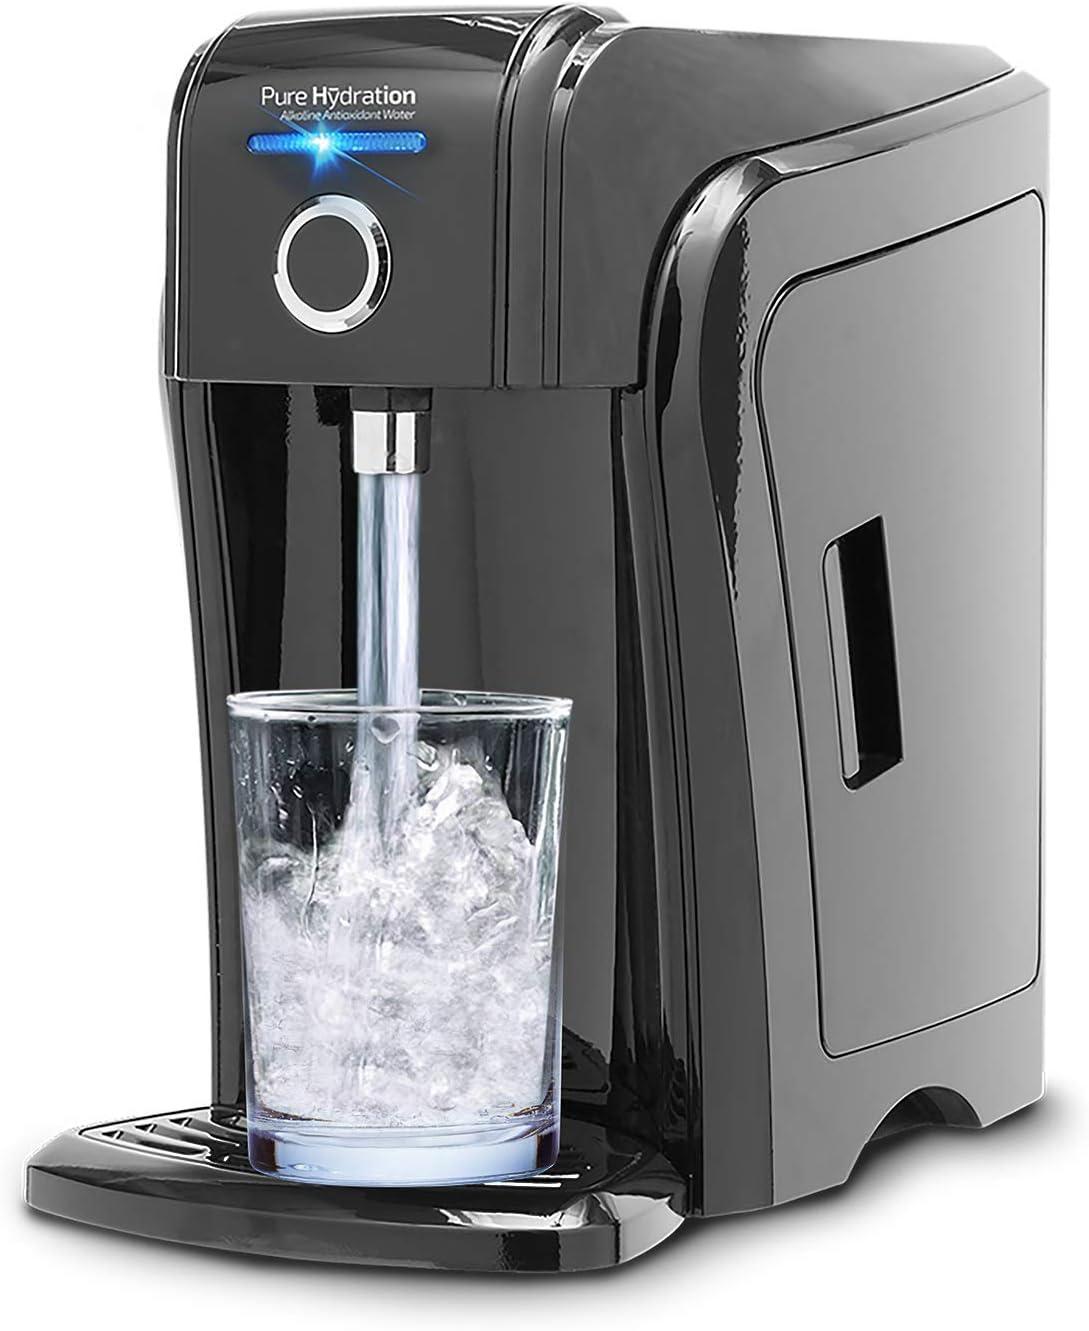 Pure Hydration PH127